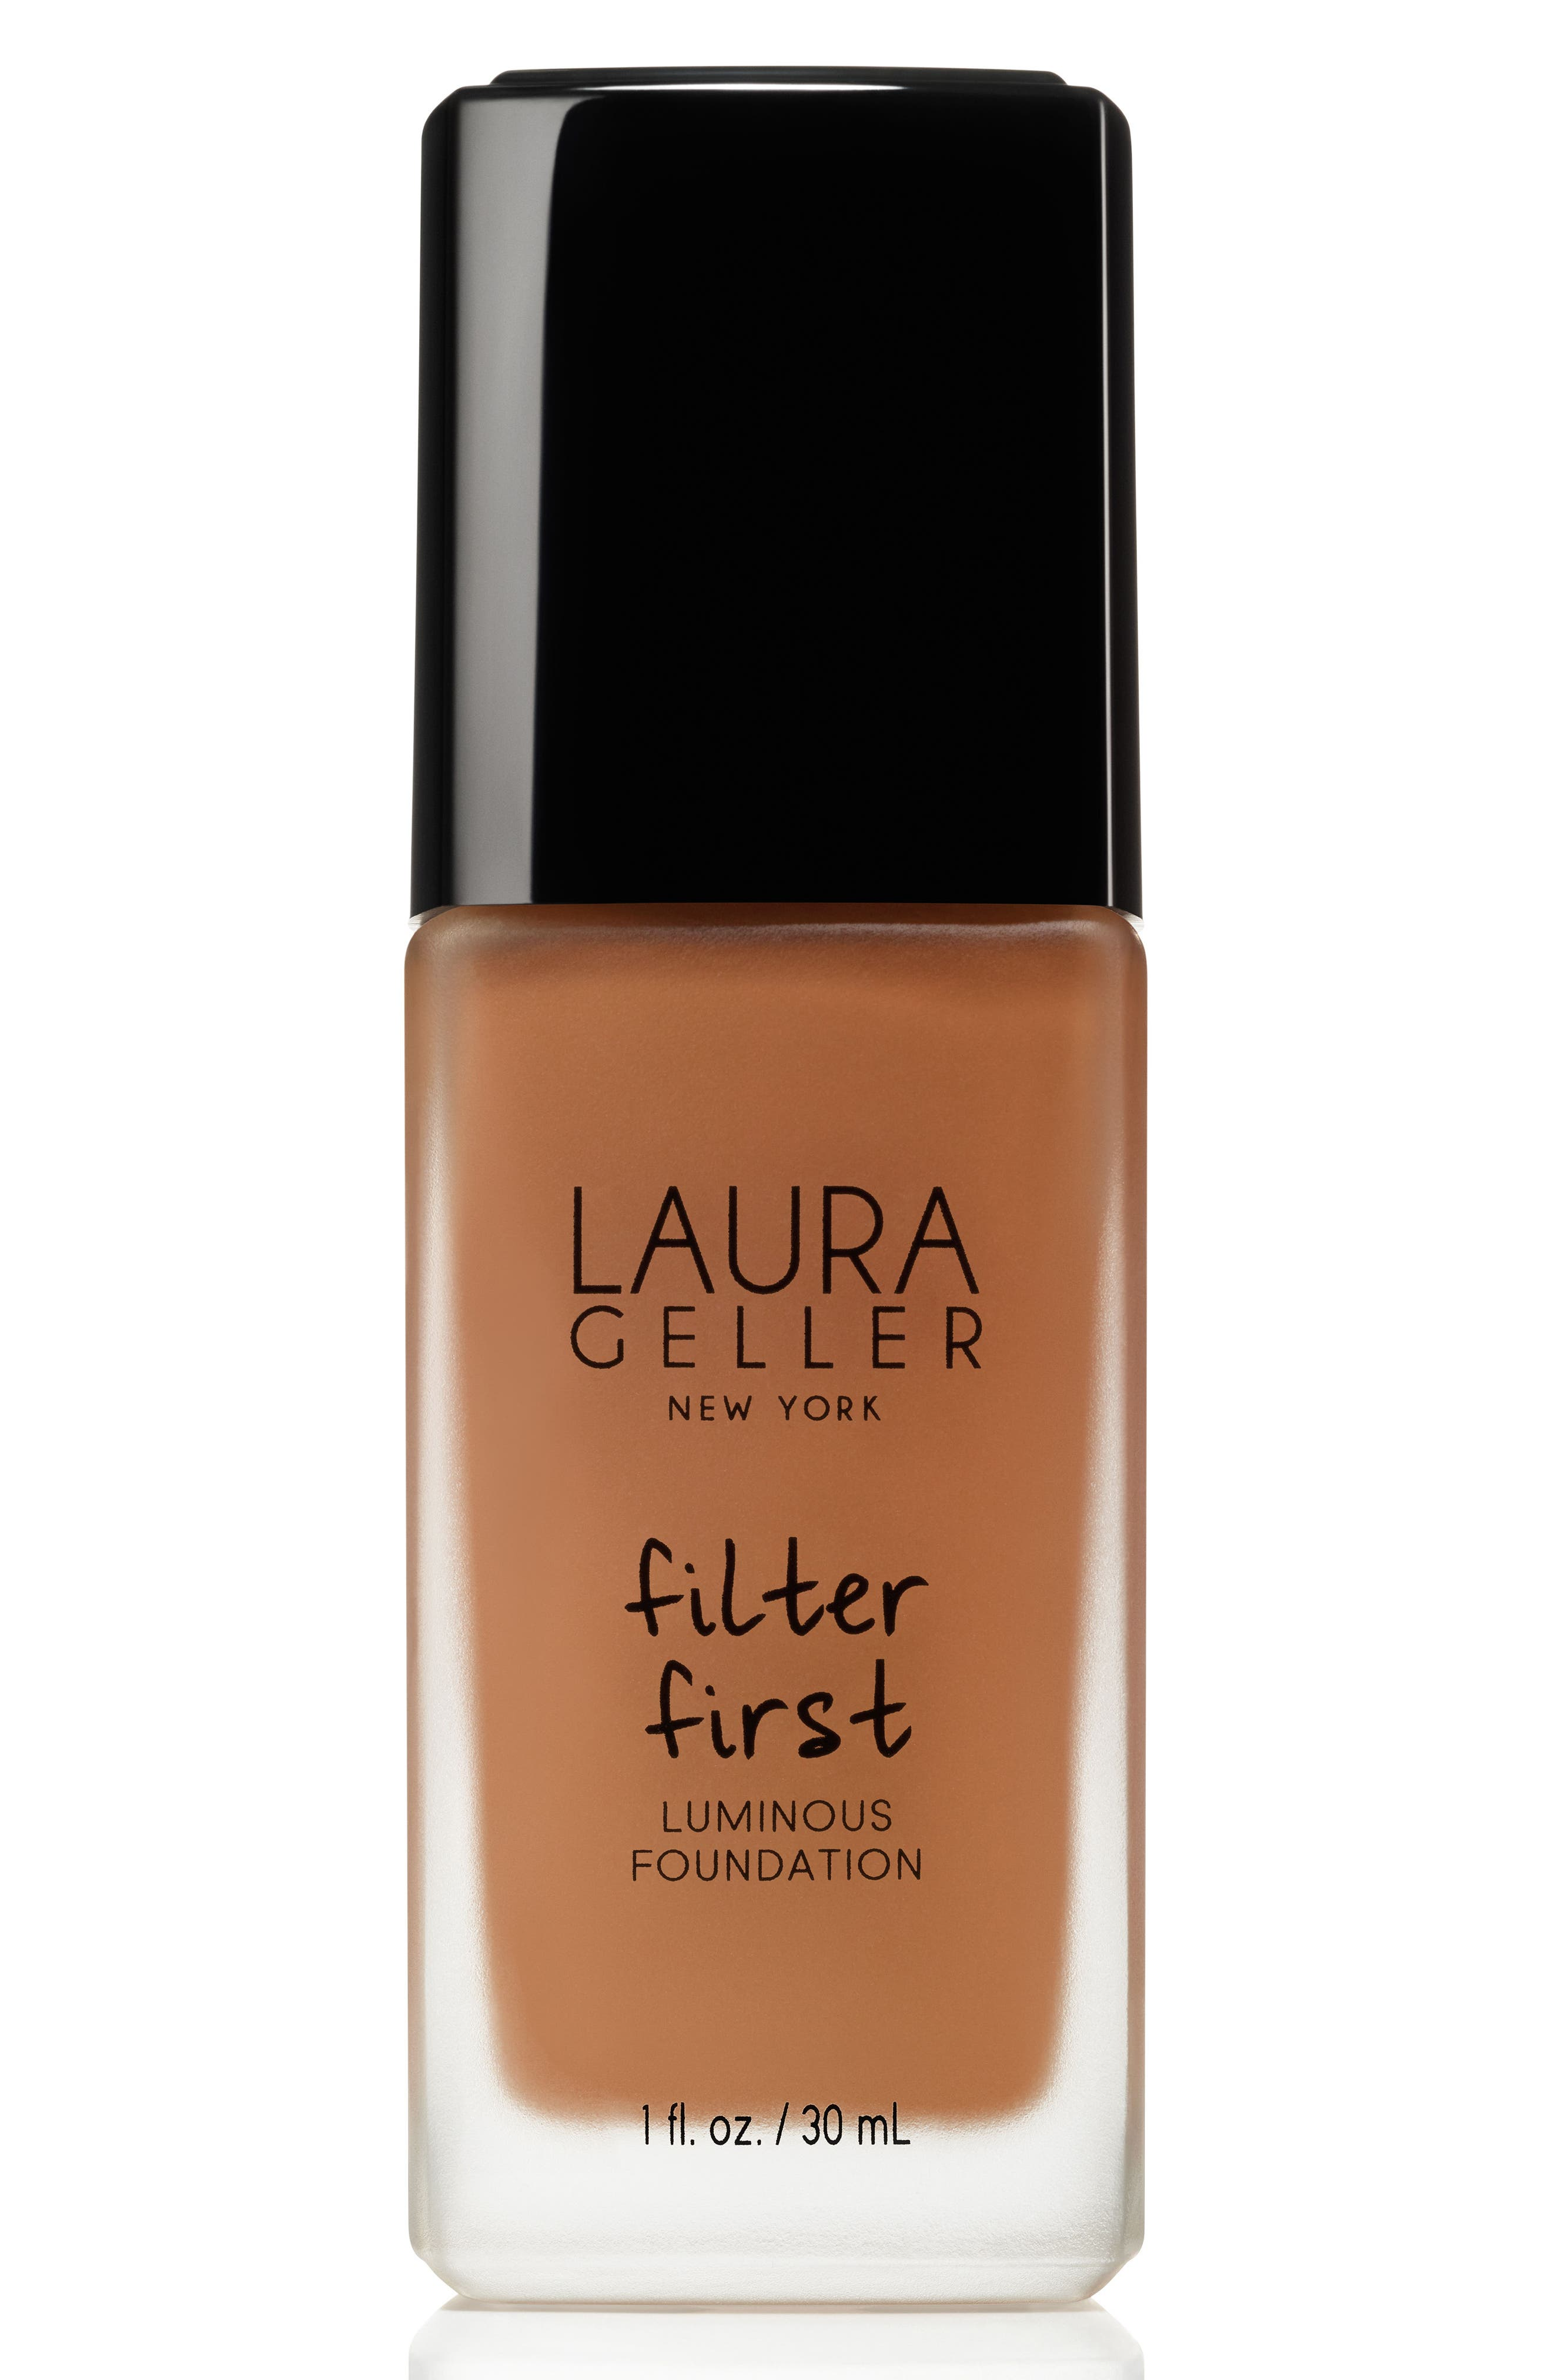 Filter First Luminous Foundation